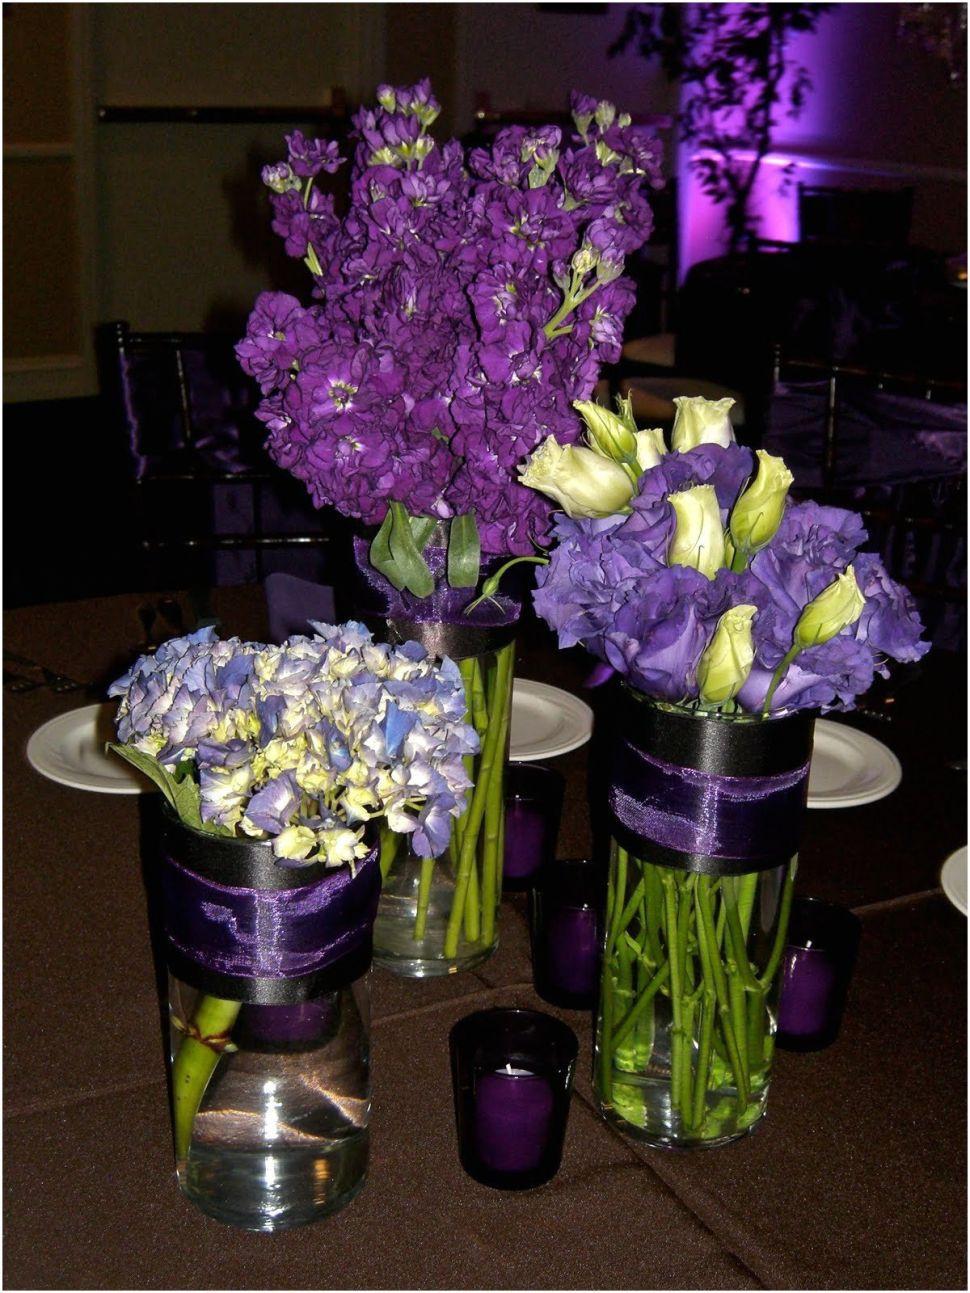 flower vase with artificial flowers online shopping of photos of purple flower vase vases artificial plants collection with purple flower vase photos purple silk flowers stupendous dsc 1329h vases purple previ 0d floor of